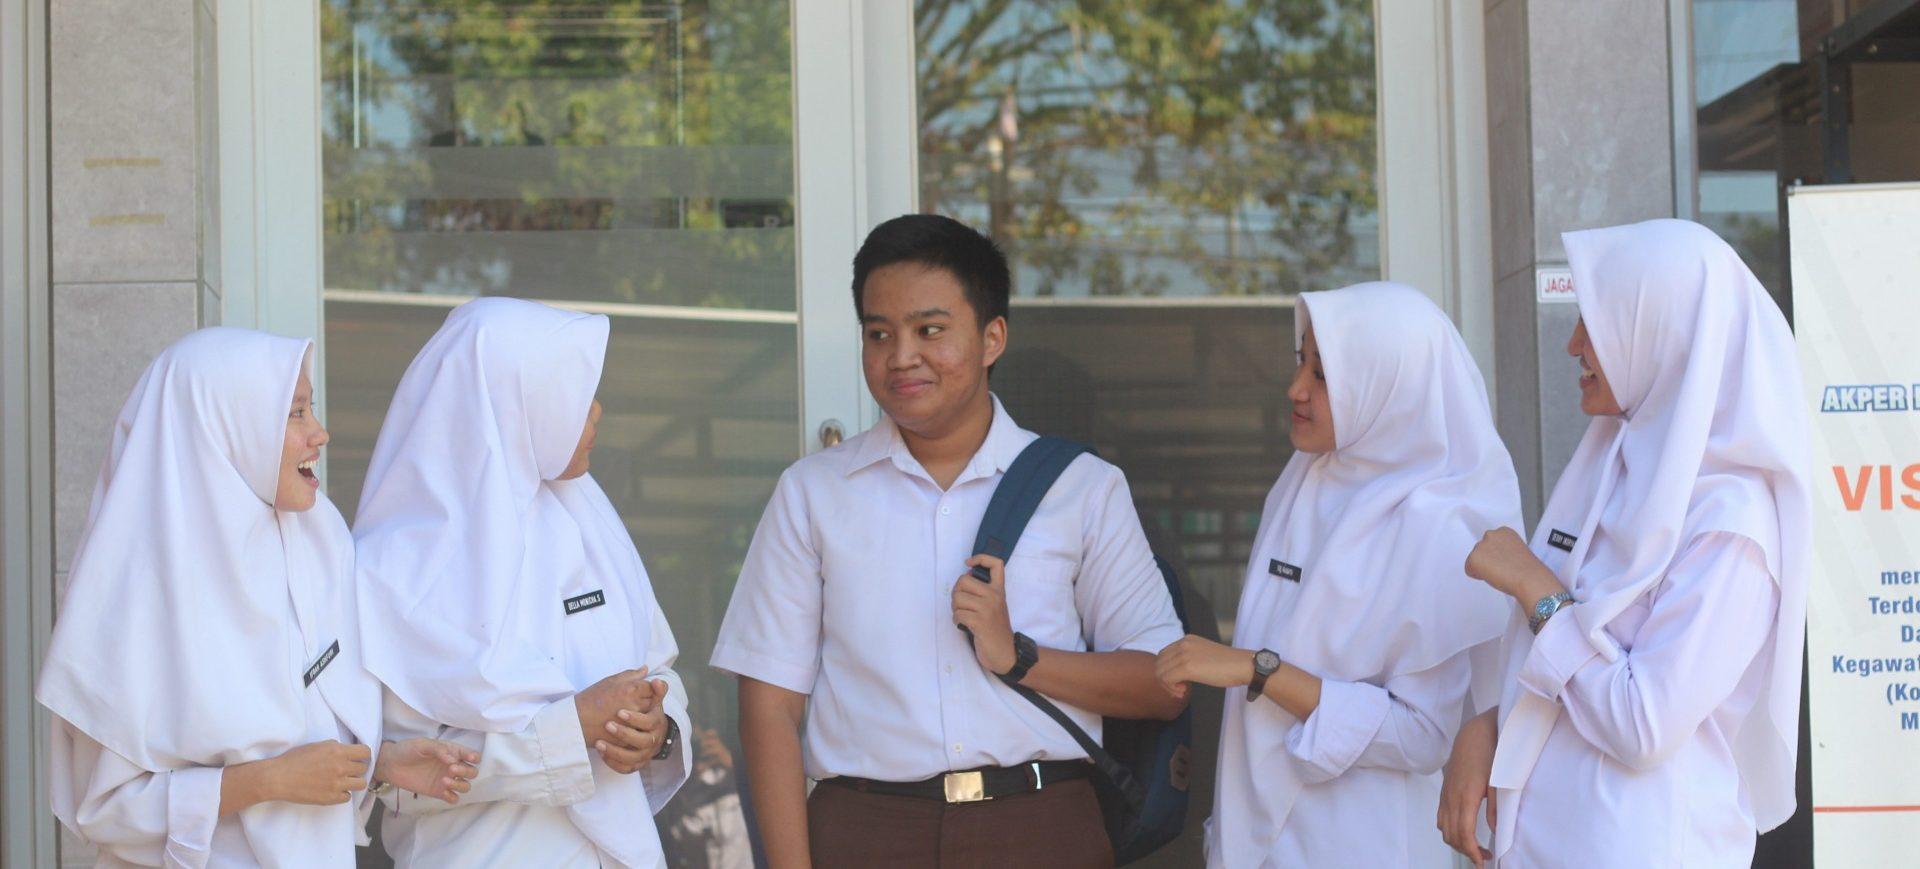 AKPER Dharma Husada Cirebon